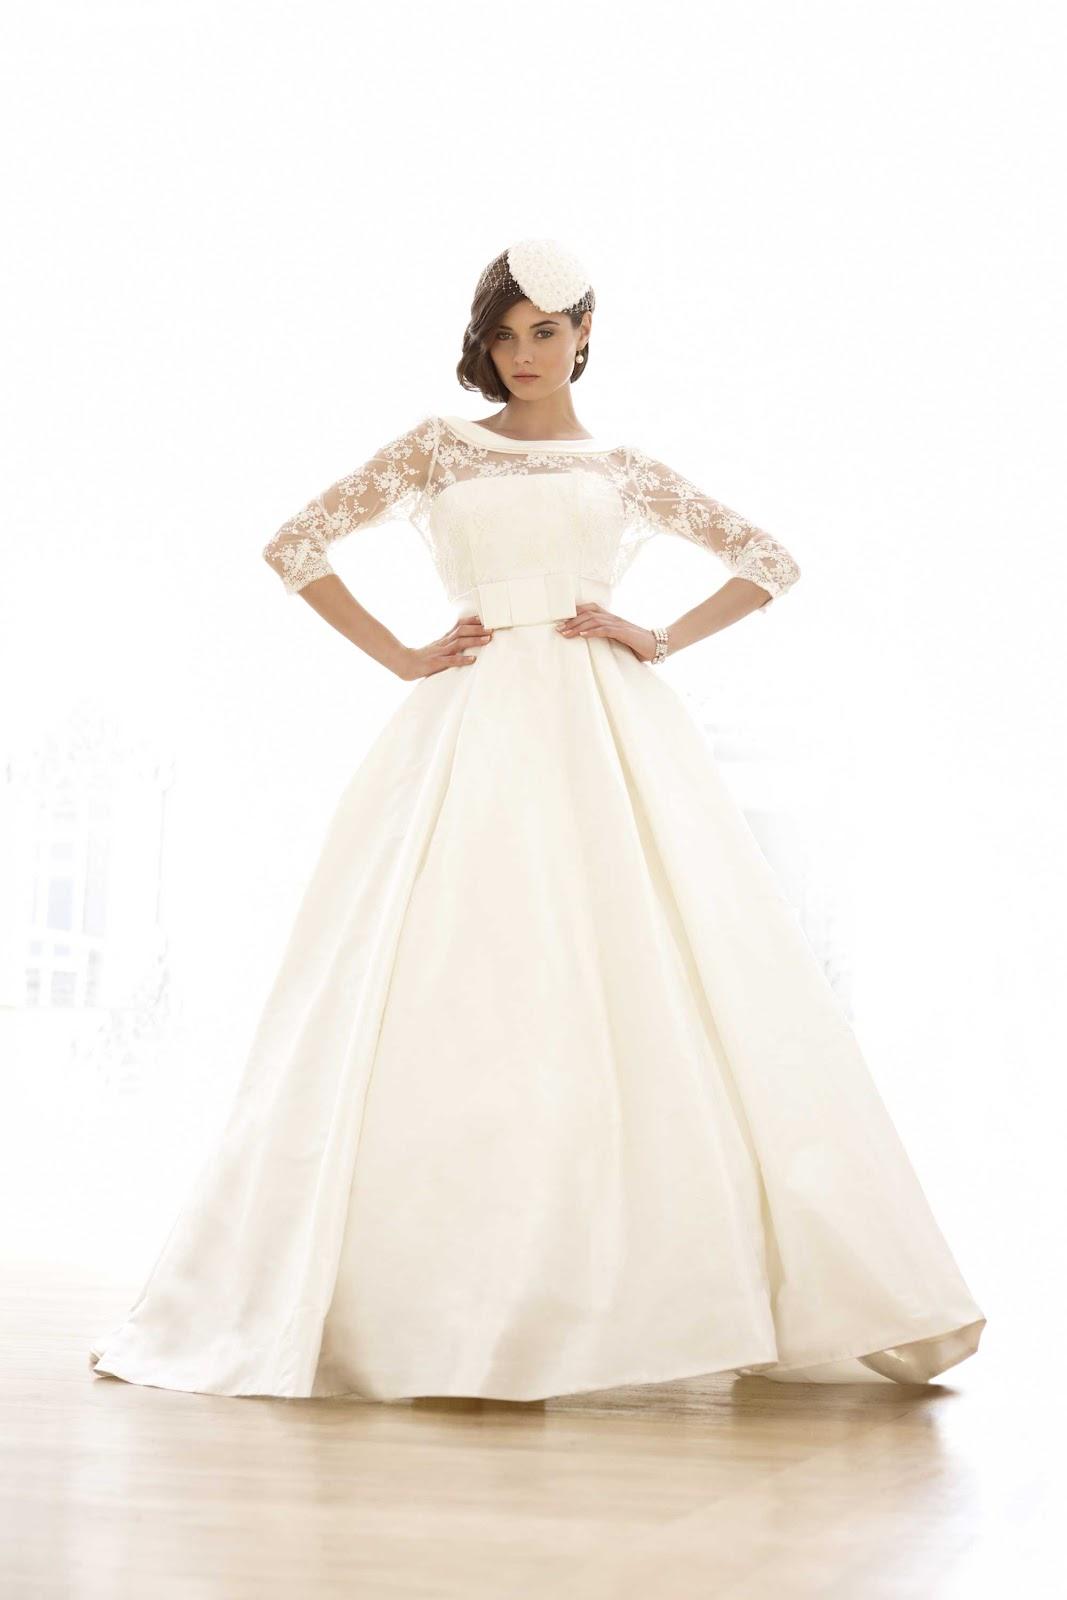 WEDDING DRESS BUSINESS Vintage Taste Wedding Dresses By Sassi Holford